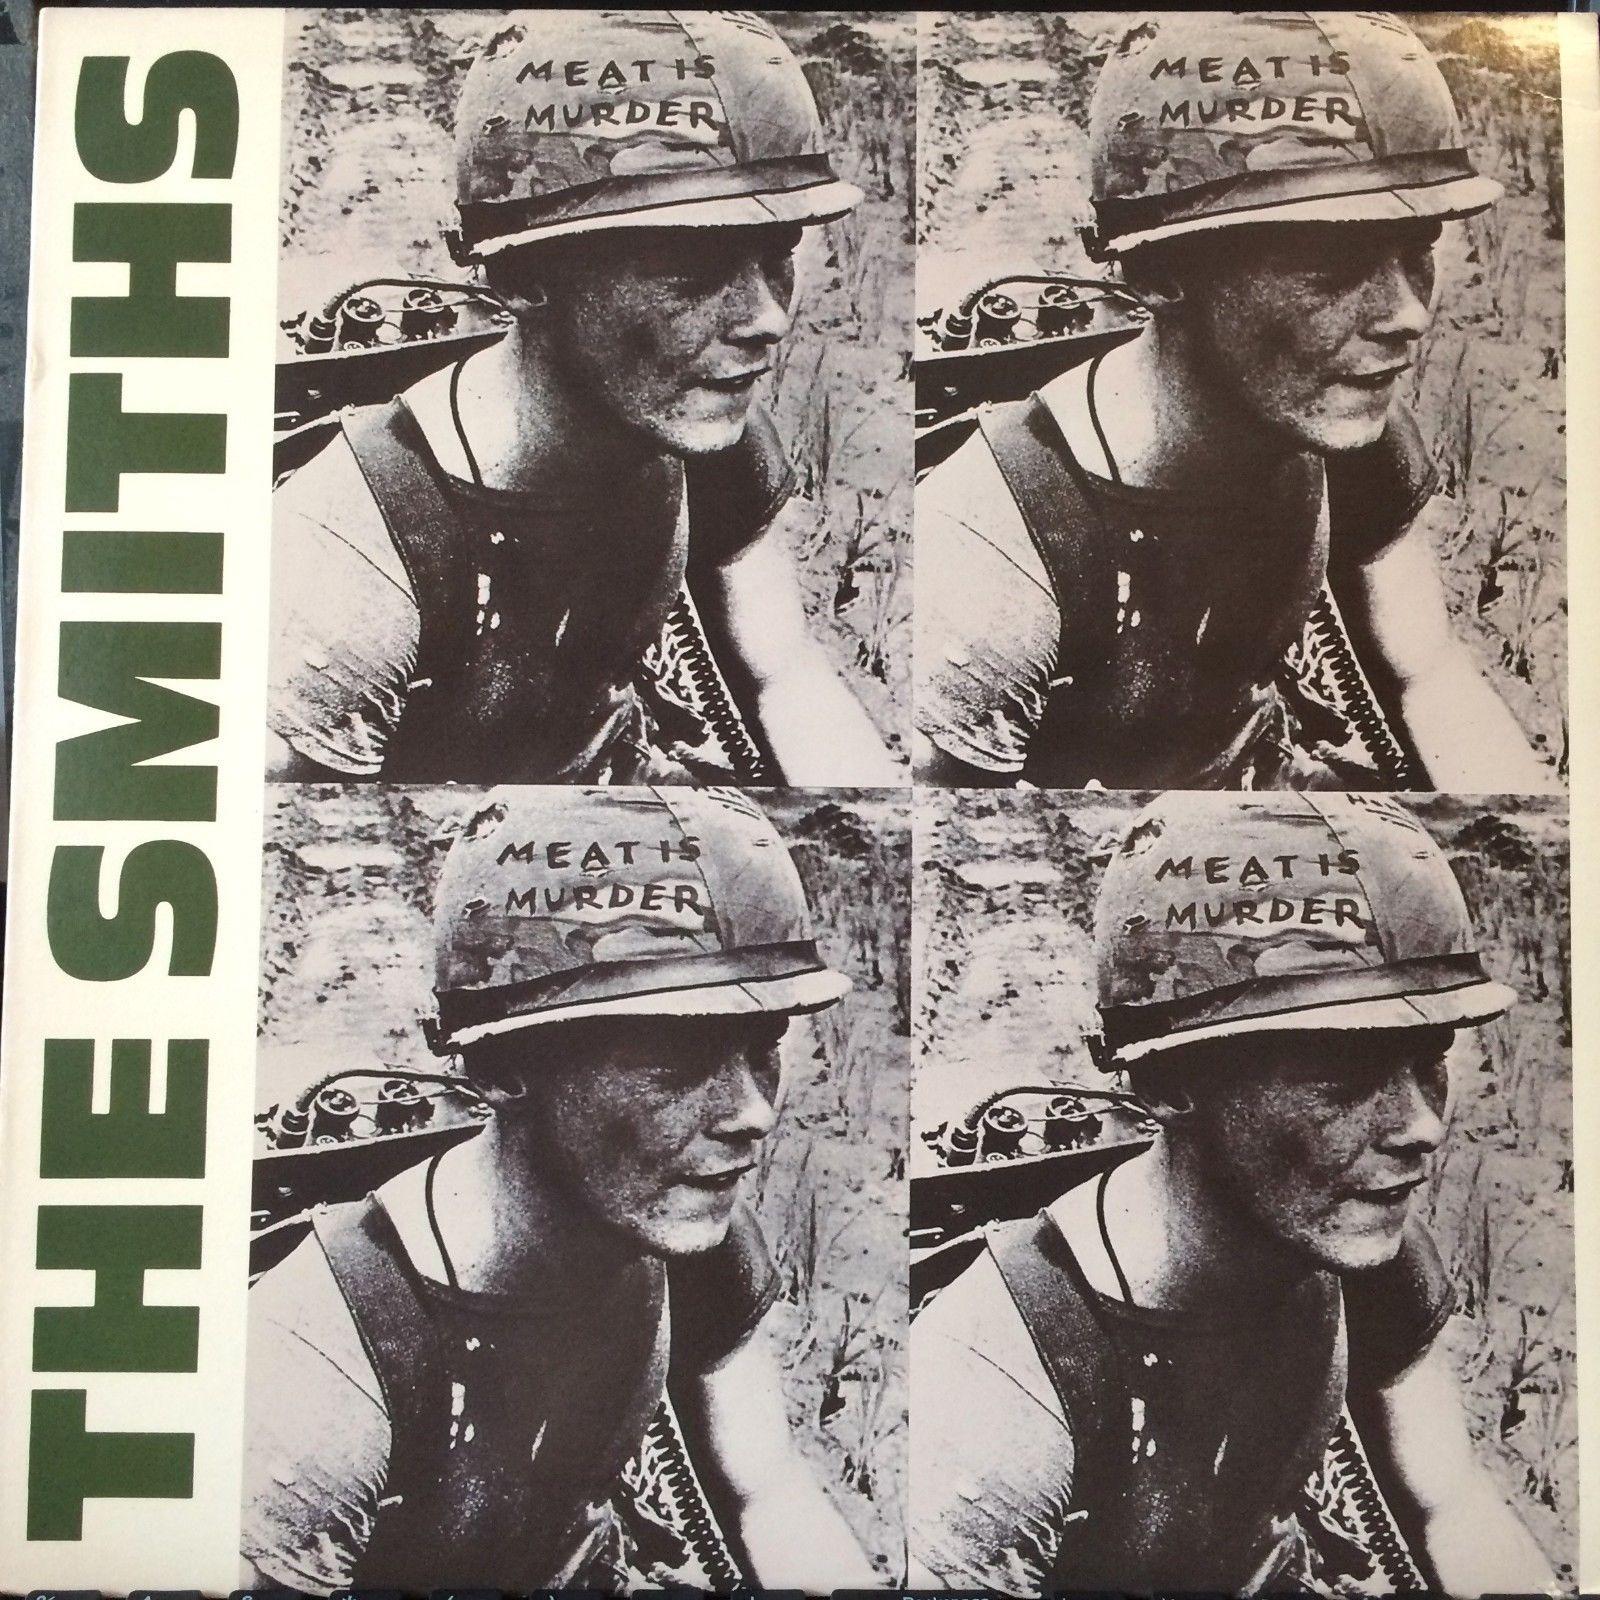 The Smiths - Meat Is Murder LP [Sire 25269-1] ORIGINAL 1985 VINYL PRESSING, NM